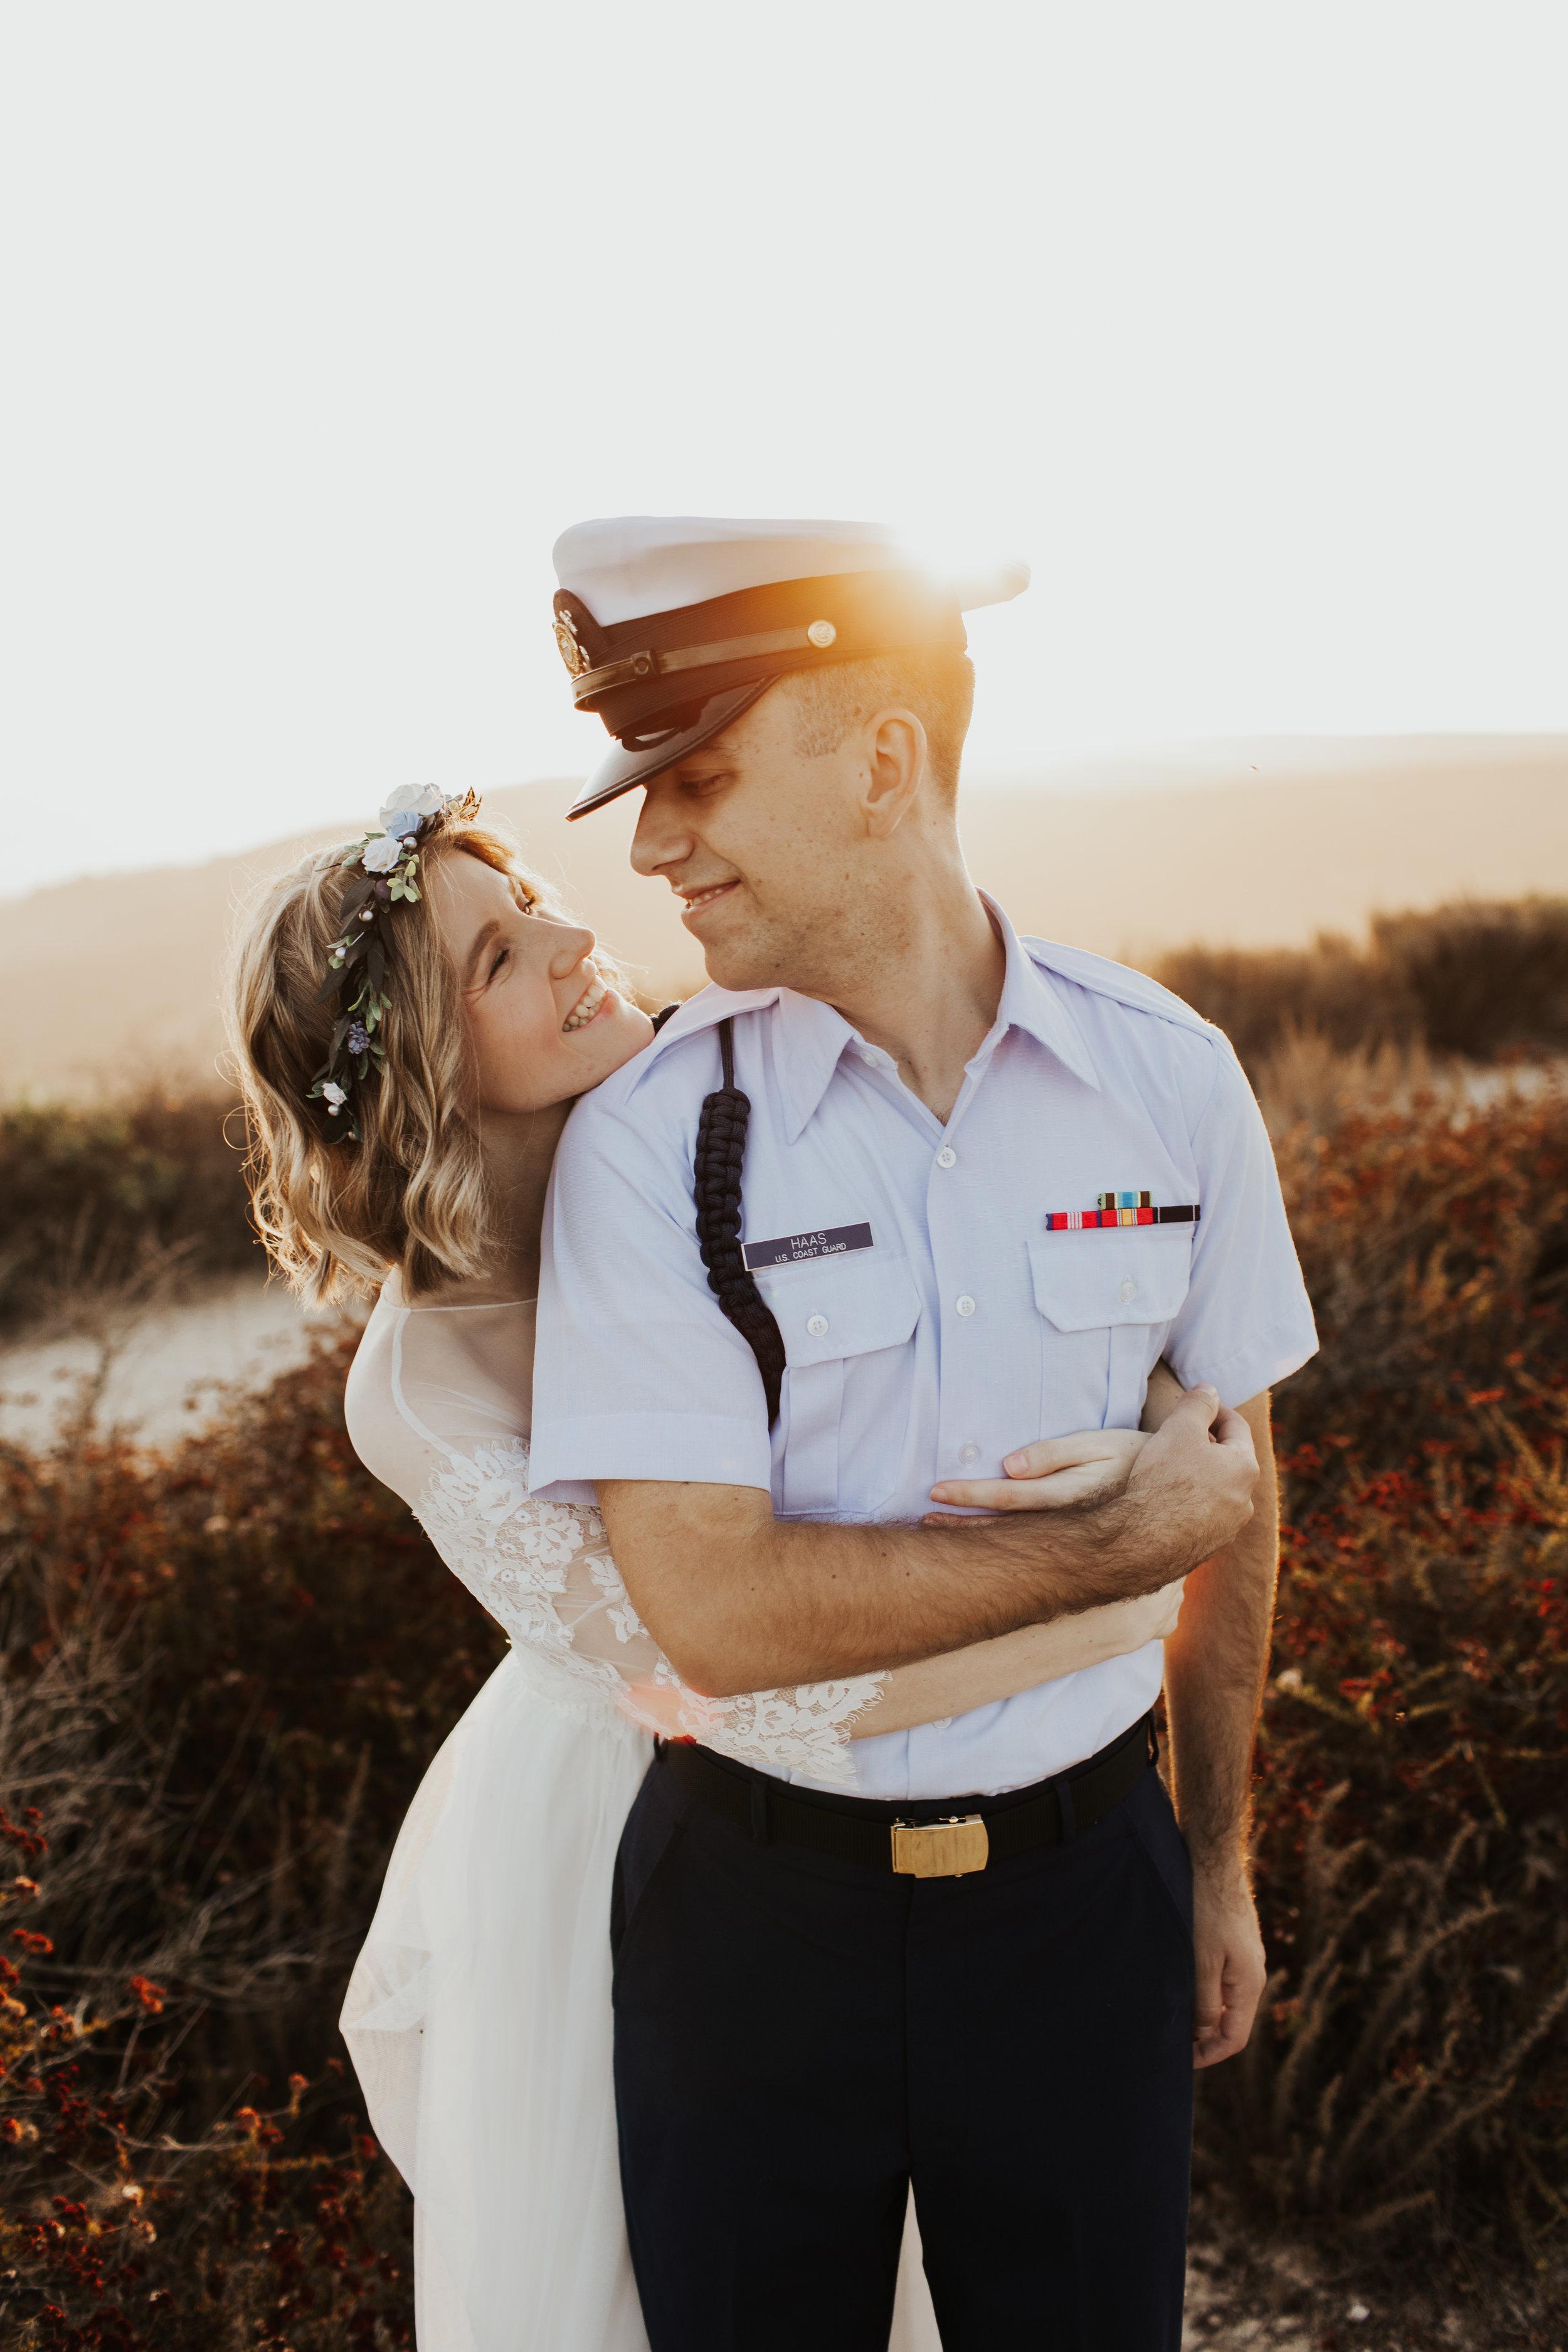 Jessie-Noah-Top-of-the-World-Laguna-Beach-Elopement-Bridal-Wedding-Session-FINISHED-45.jpg